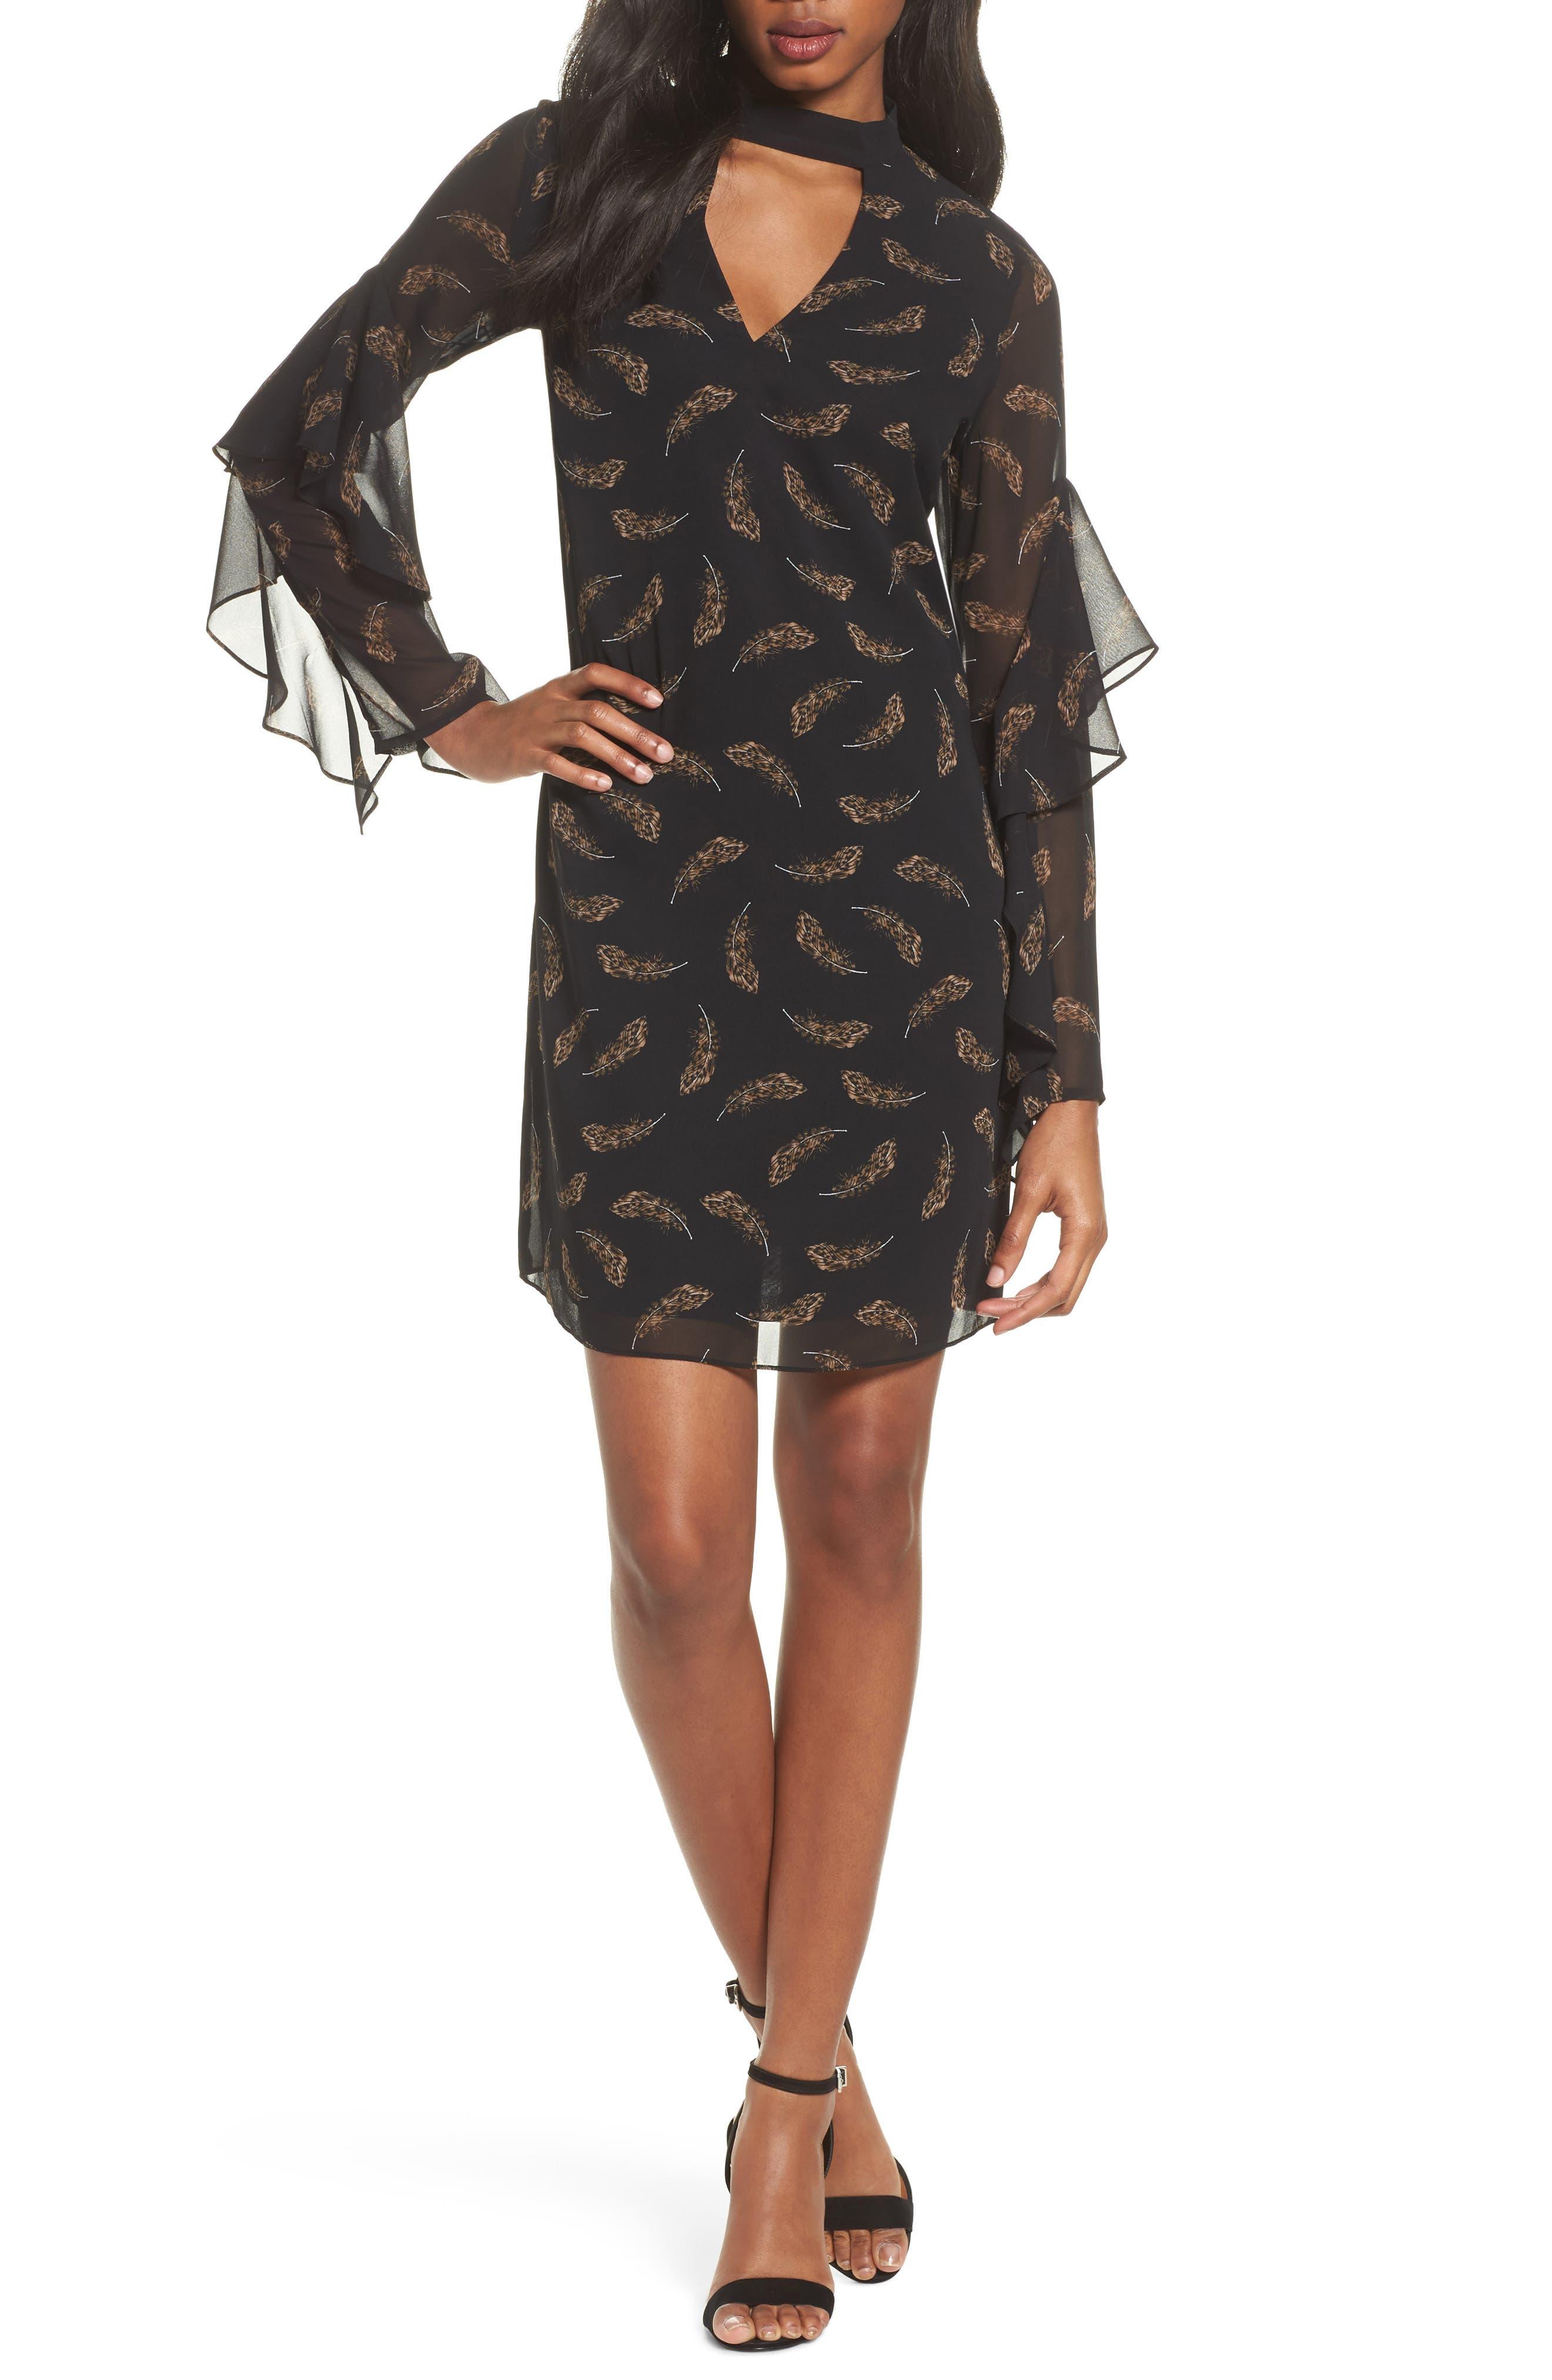 Feather Print Choker Collar Dress,                             Main thumbnail 1, color,                             Leopard Feather